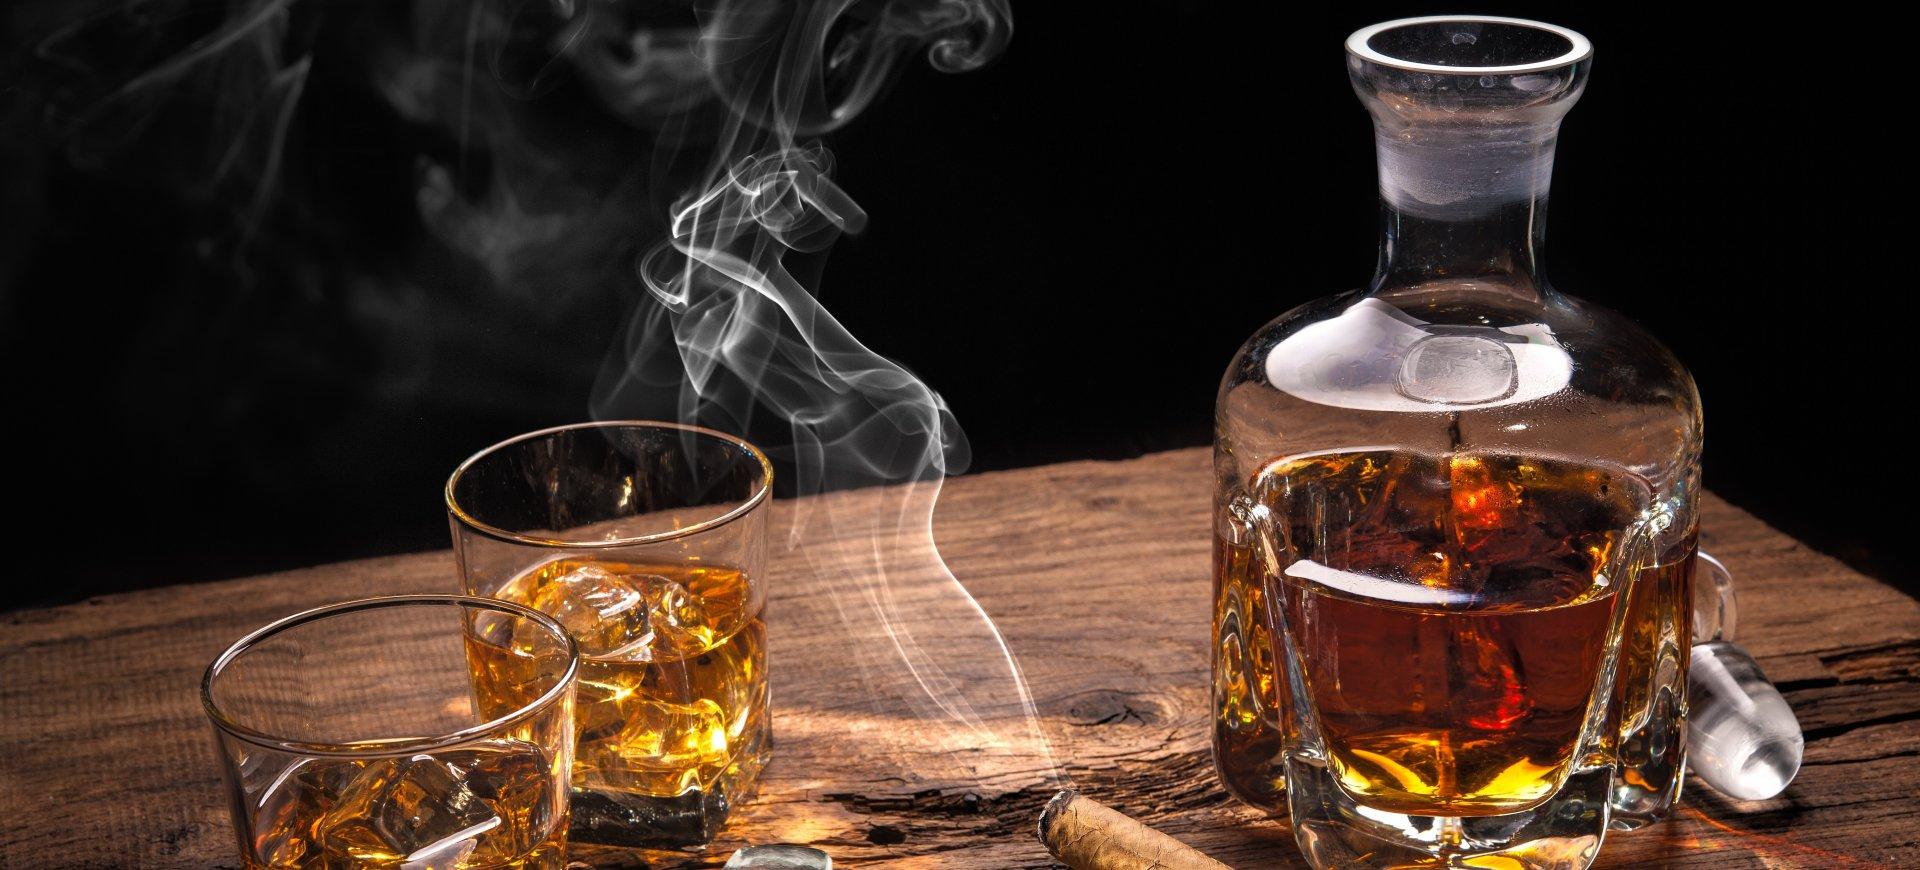 Whisky night 31.05.2019